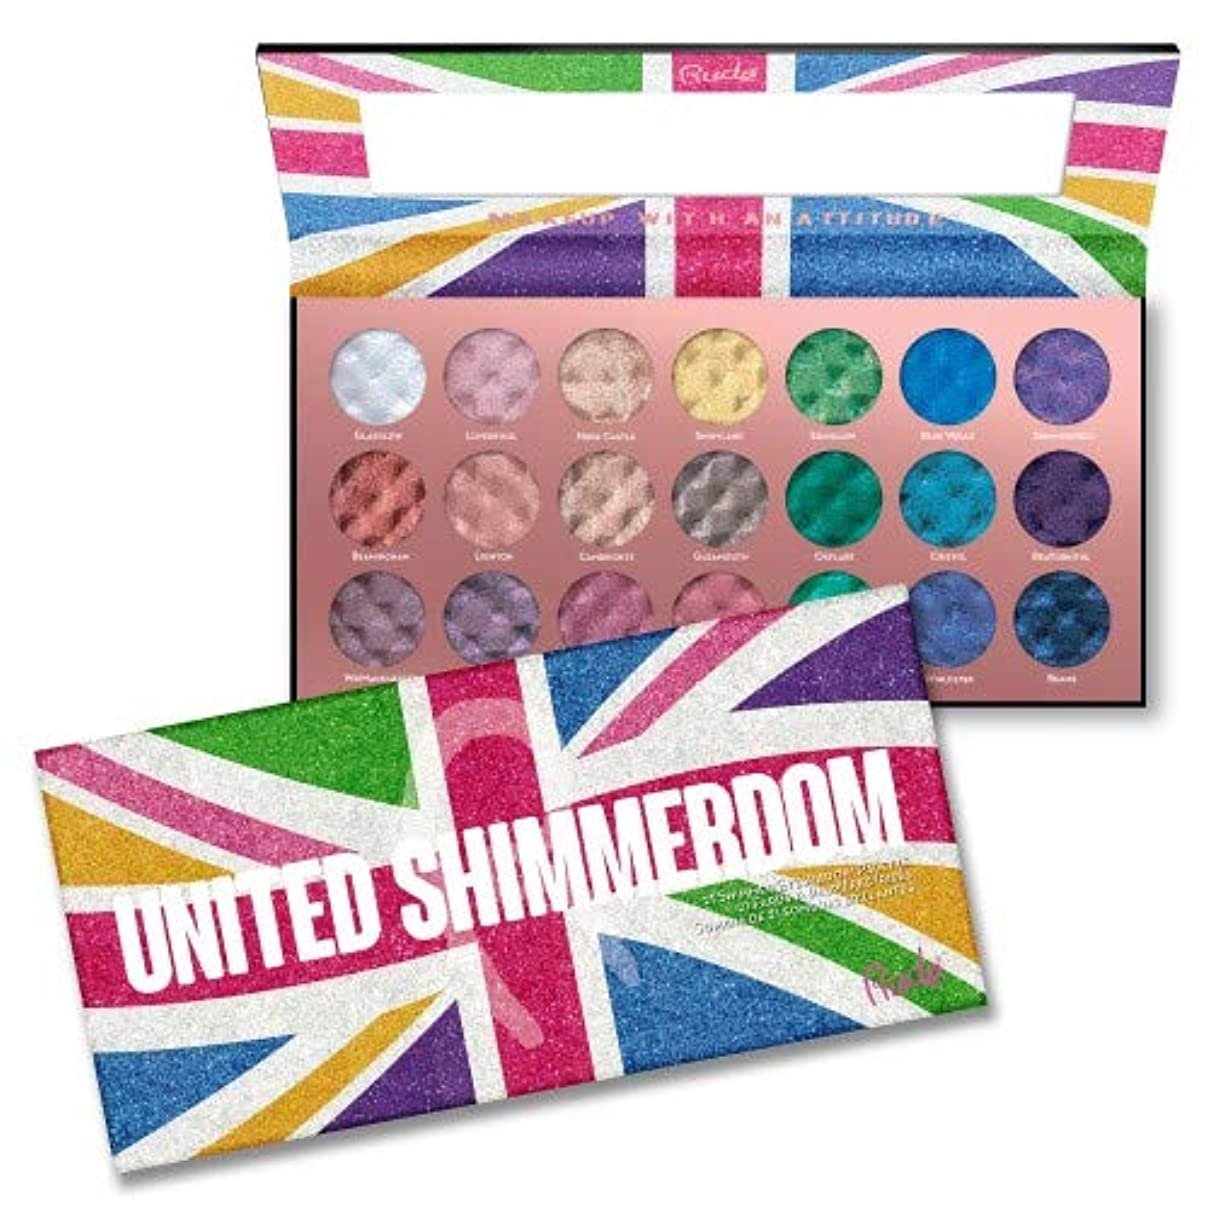 (6 Pack) RUDE United Shimmerdom - 21 Shimmer Eyeshadow Palette (並行輸入品)